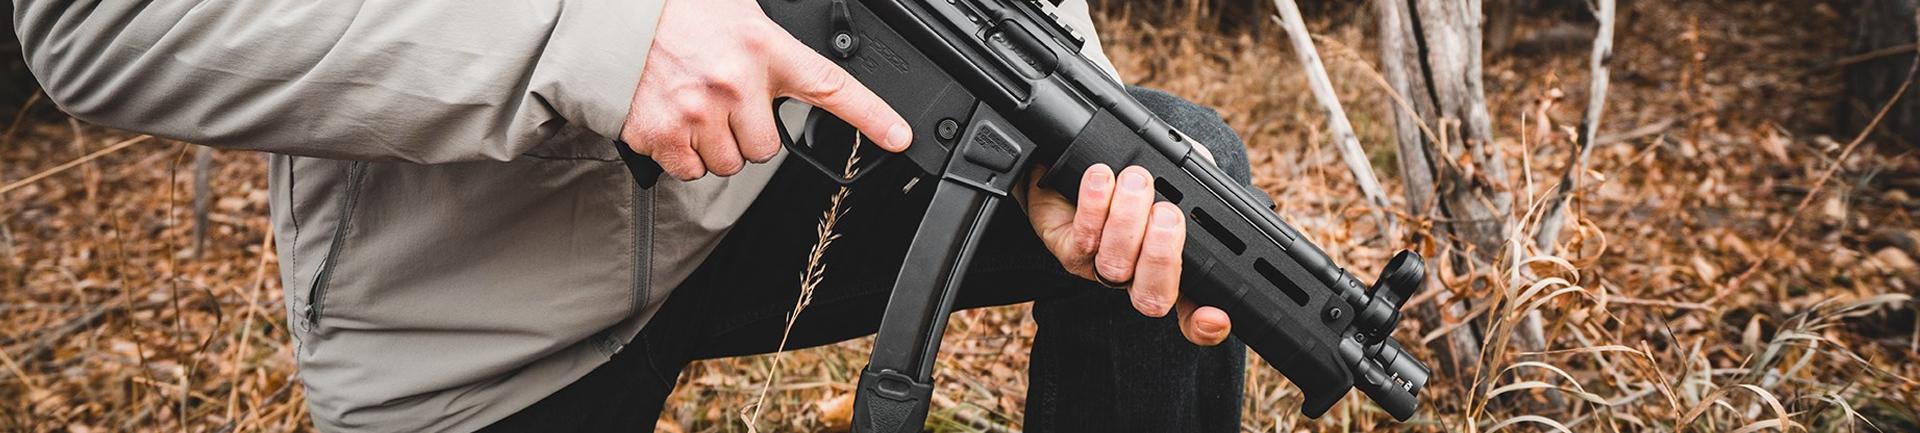 MP5® / HK94